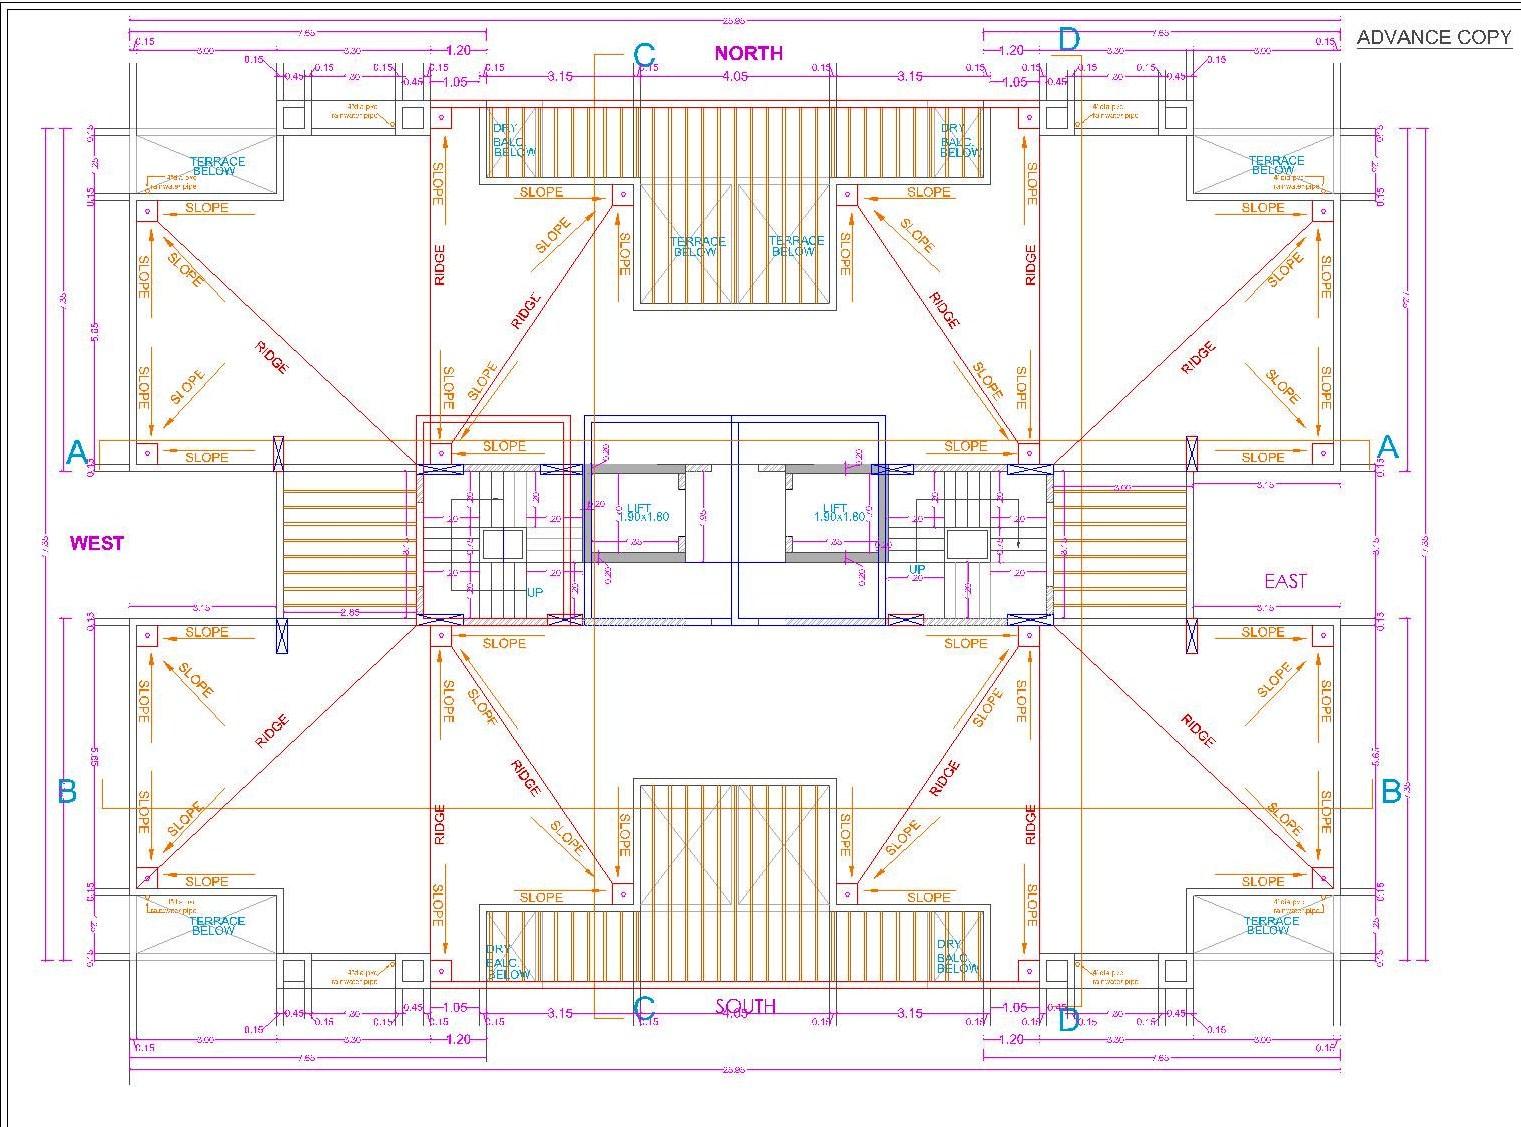 5 Bedroom Mobile Home Floor Plans Architectural Portfolio 2013